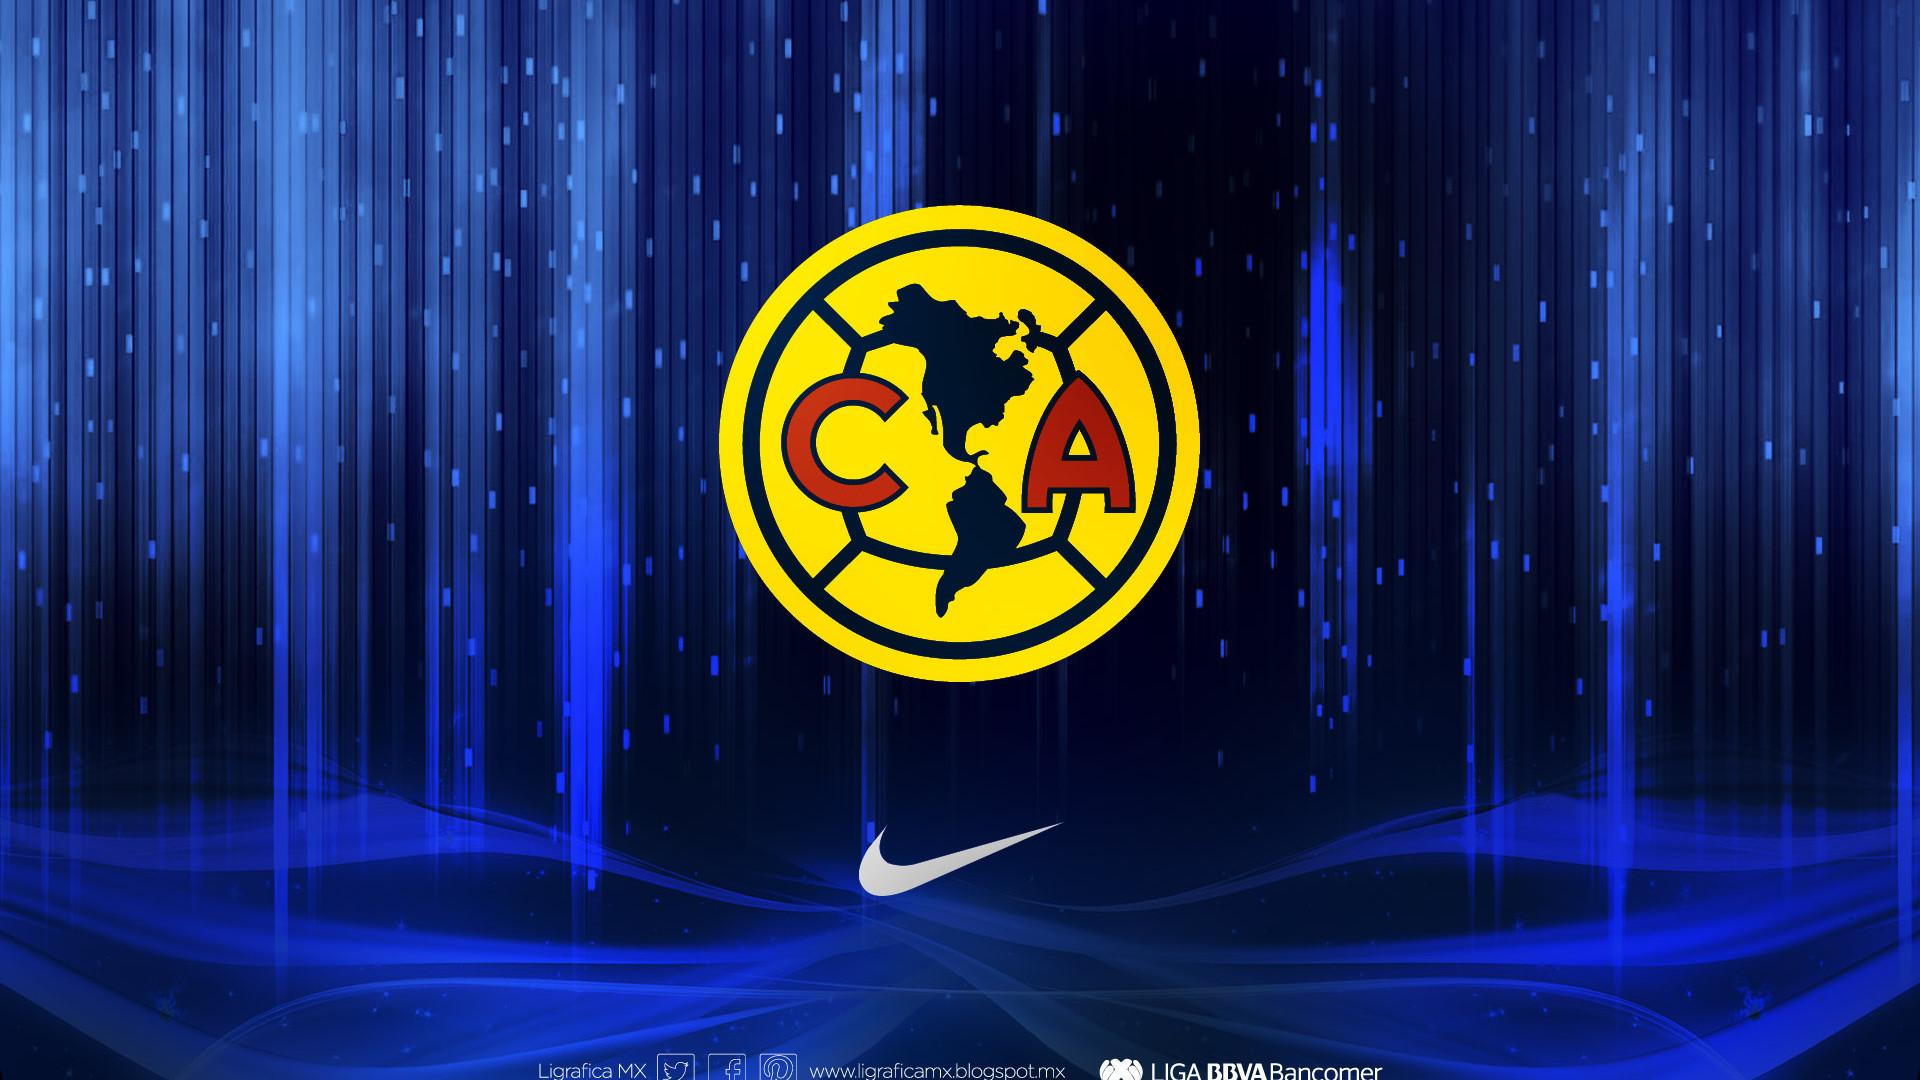 football, club america, club america logo Wallpapers and .